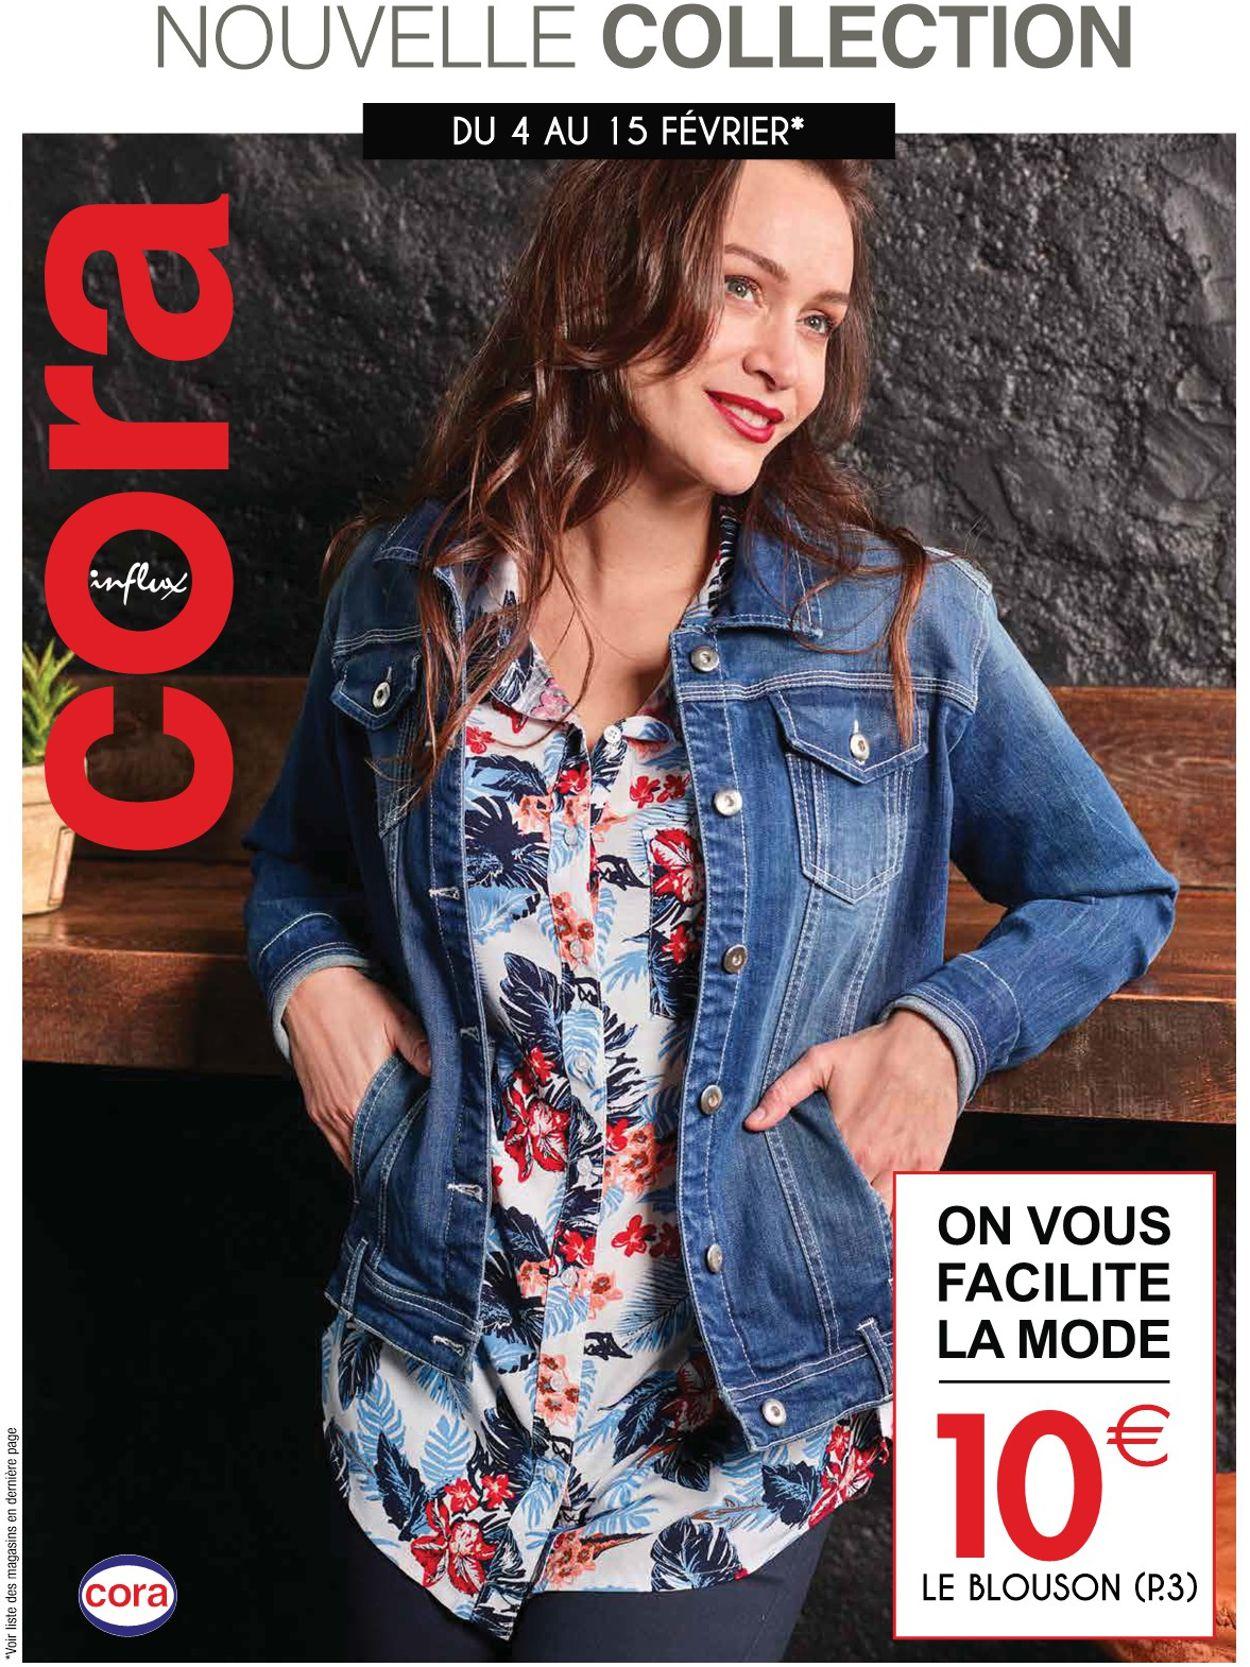 Cora Catalogue - 04.02-15.02.2020